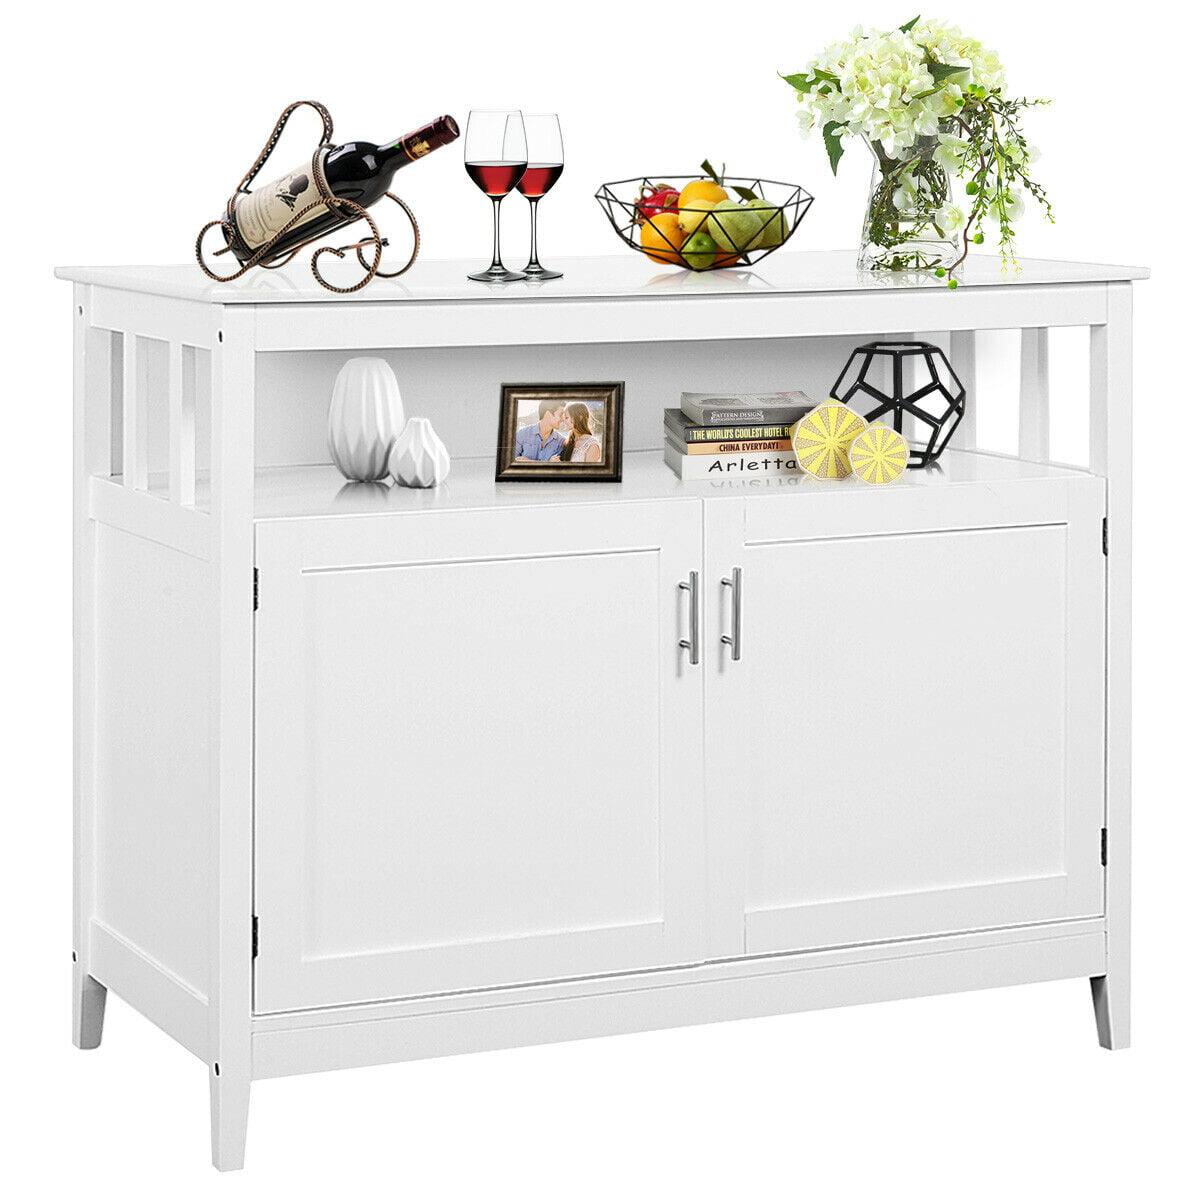 Costway Modern Kitchen Storage Cabinet Buffet Server Table Sideboard Dining  Wood White - Walmart.com